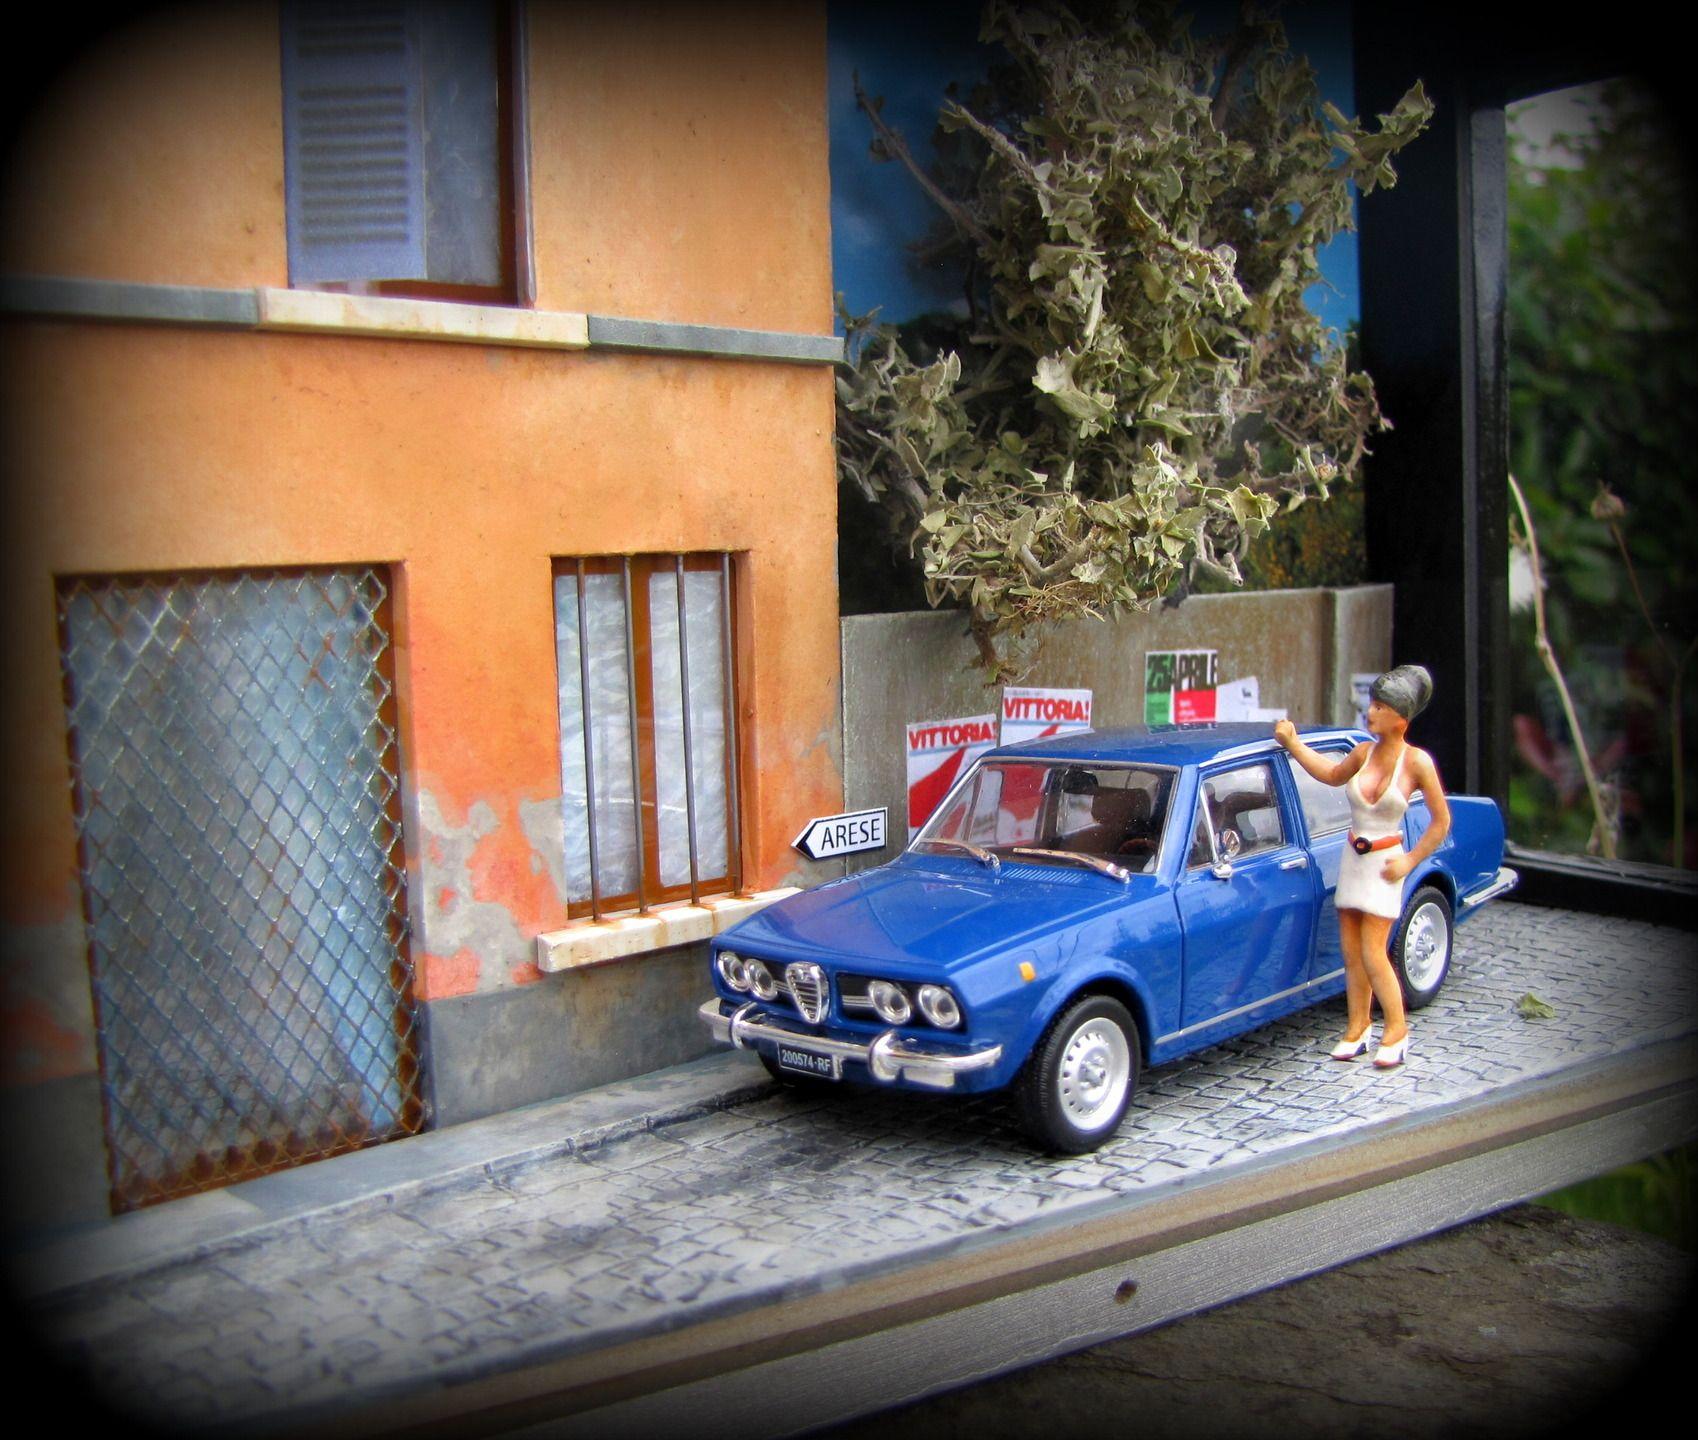 Vitrine Miniature 143 Échelle Voiture Déco Par Alfetta Alfa Romeo lF3TcJK1